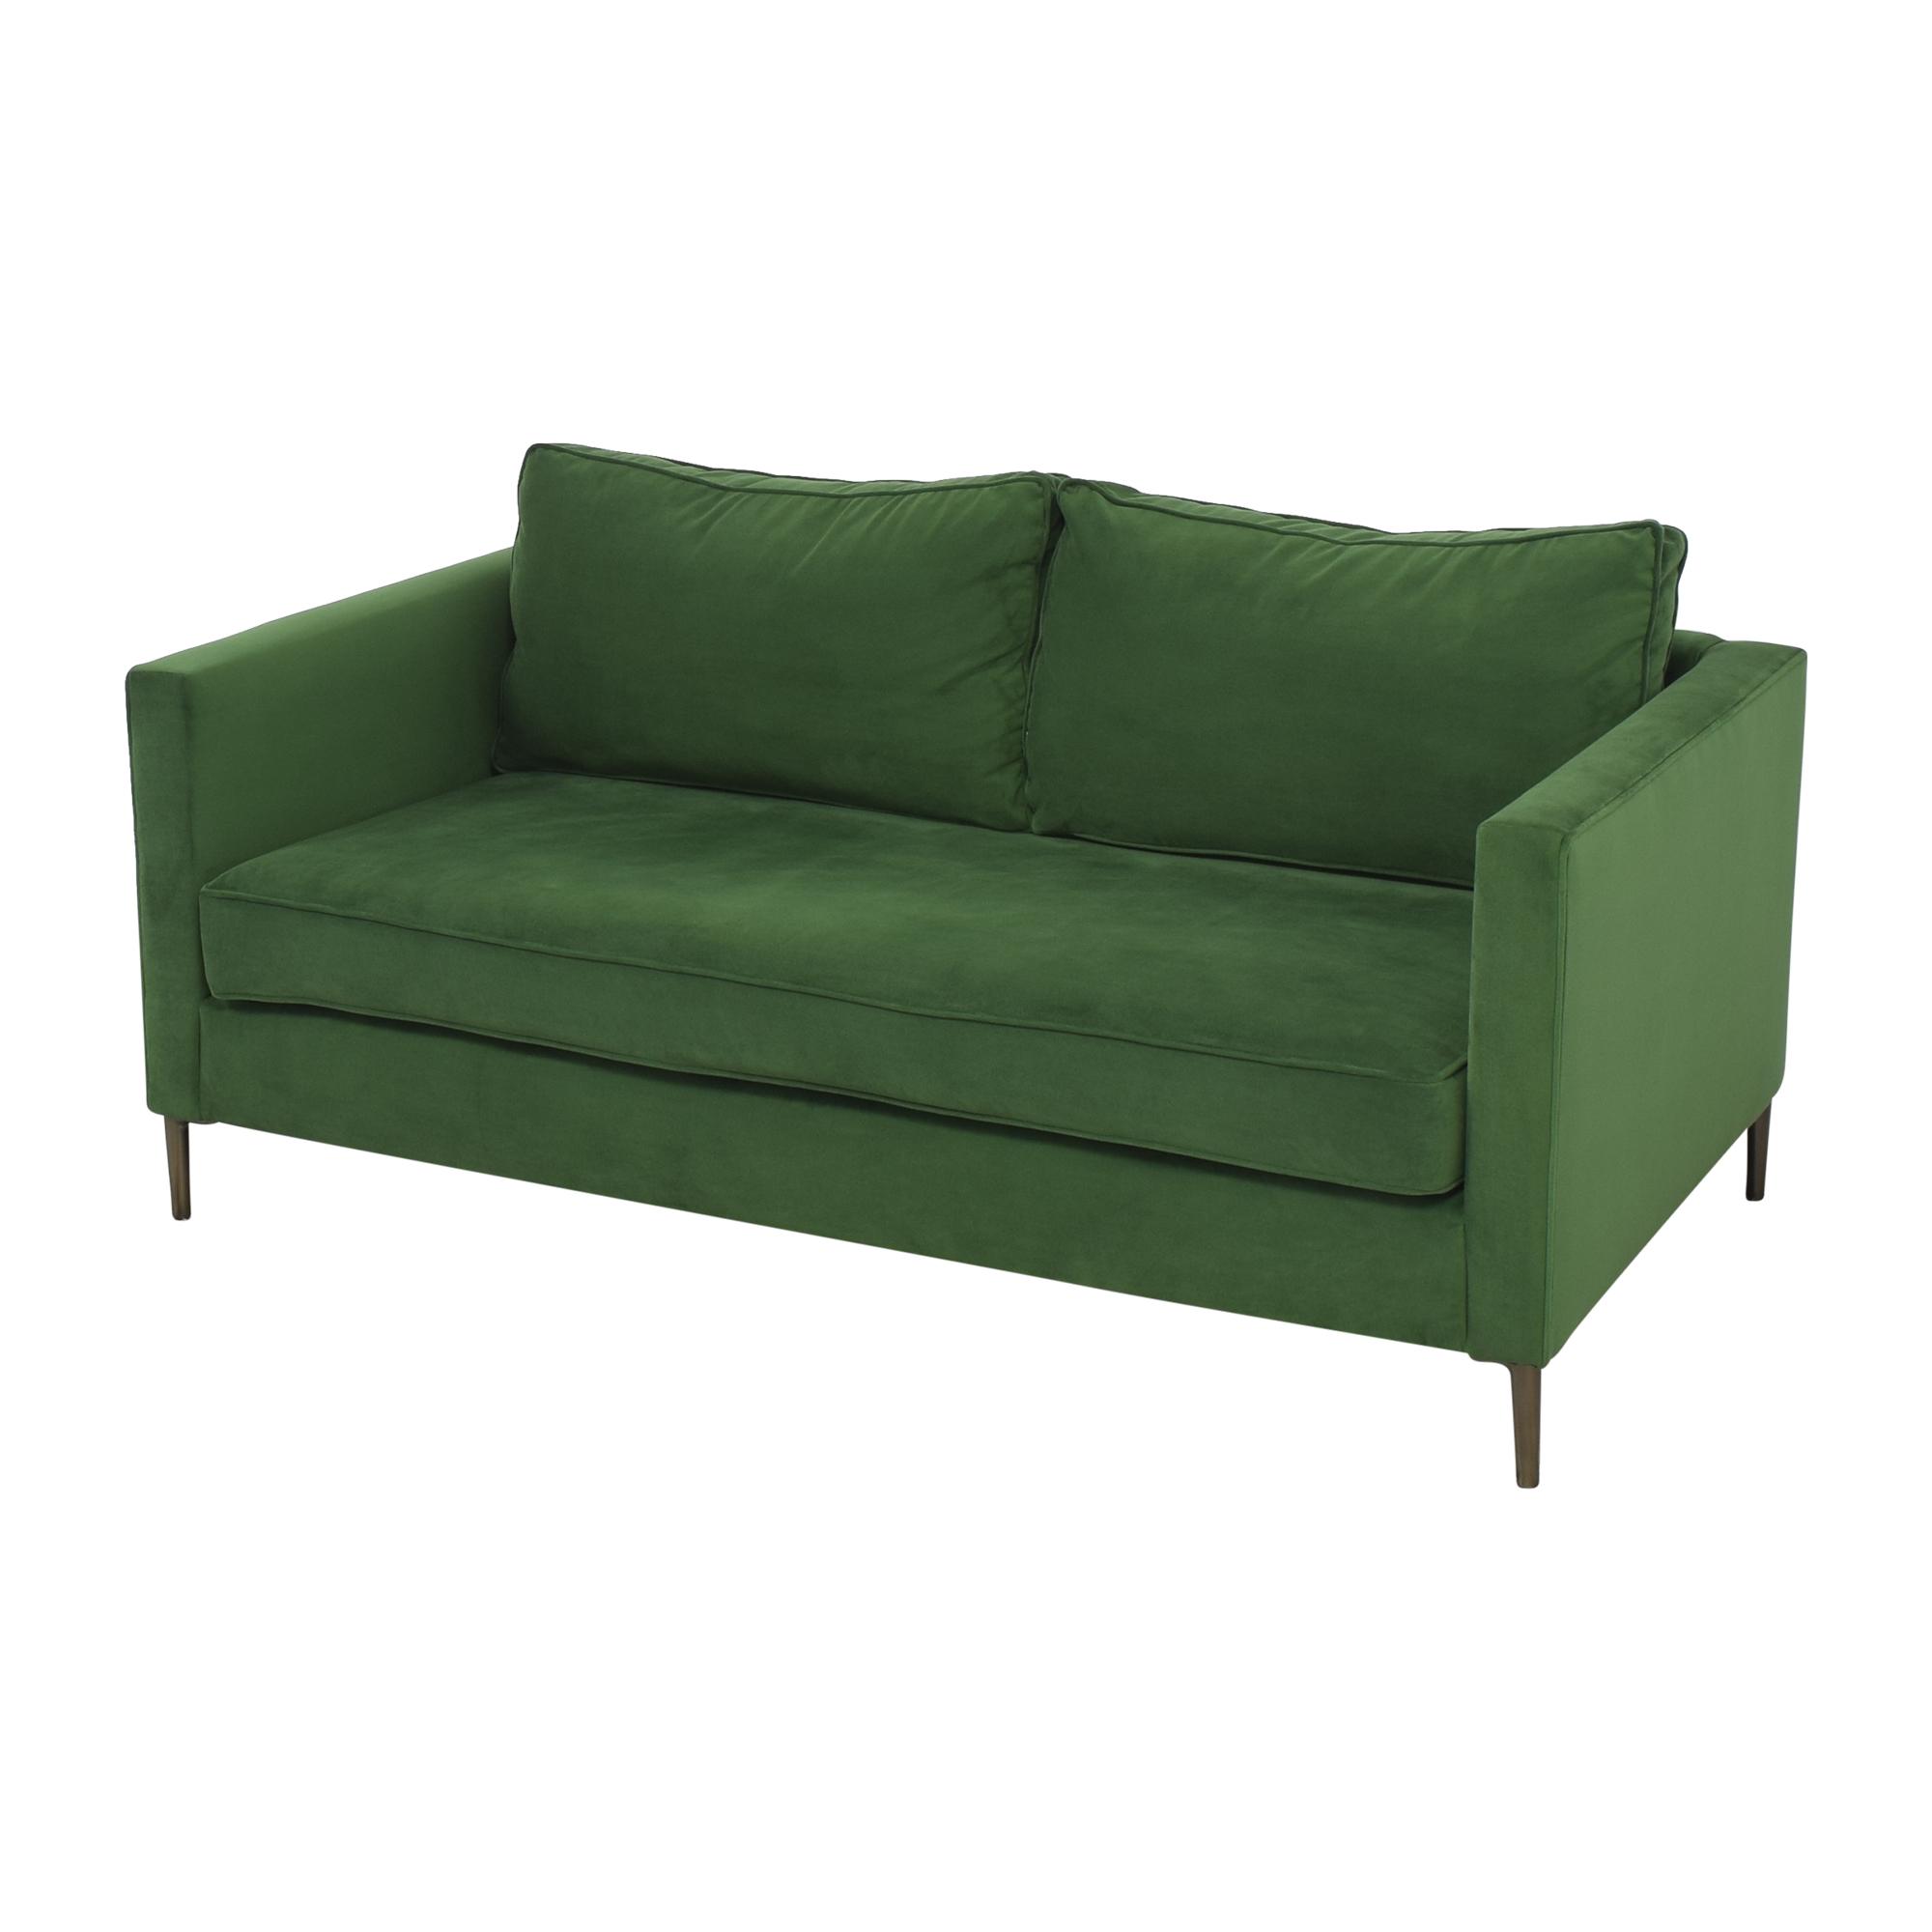 buy West Elm West Elm Harris Loft Sofa online